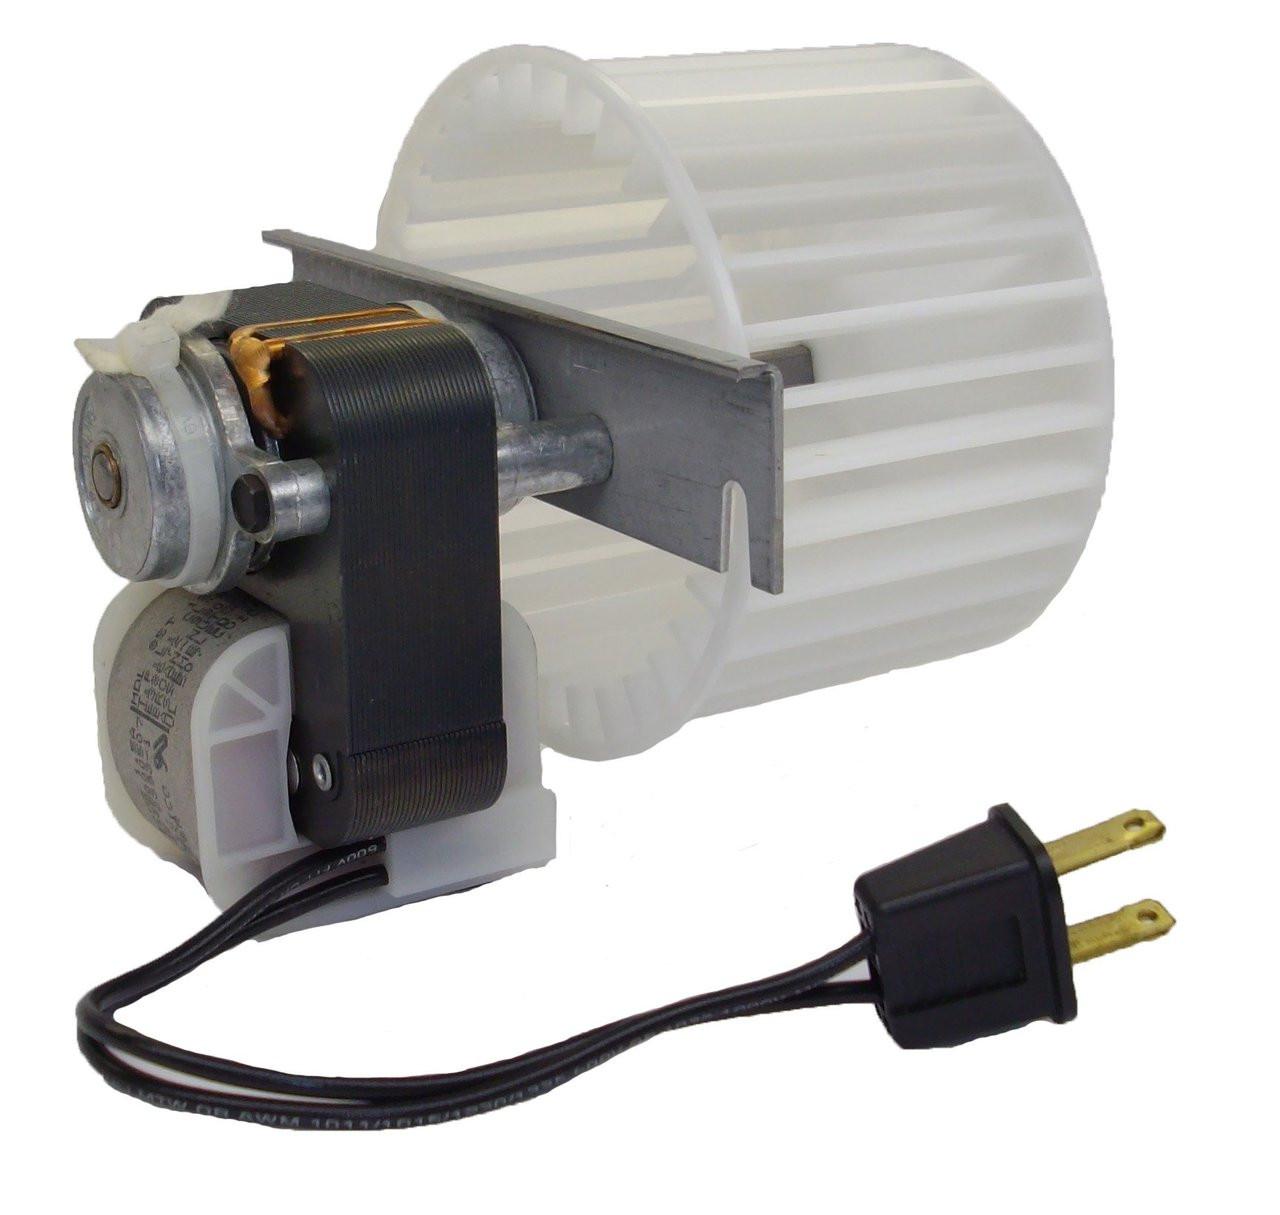 97005906__09780.1435075858.1280.1280?c=2 broan 162 a, 162 b vent fan motor 2650 rpm, 1 5 amp, 120v 97005906 nutone 665rp wiring diagram at eliteediting.co